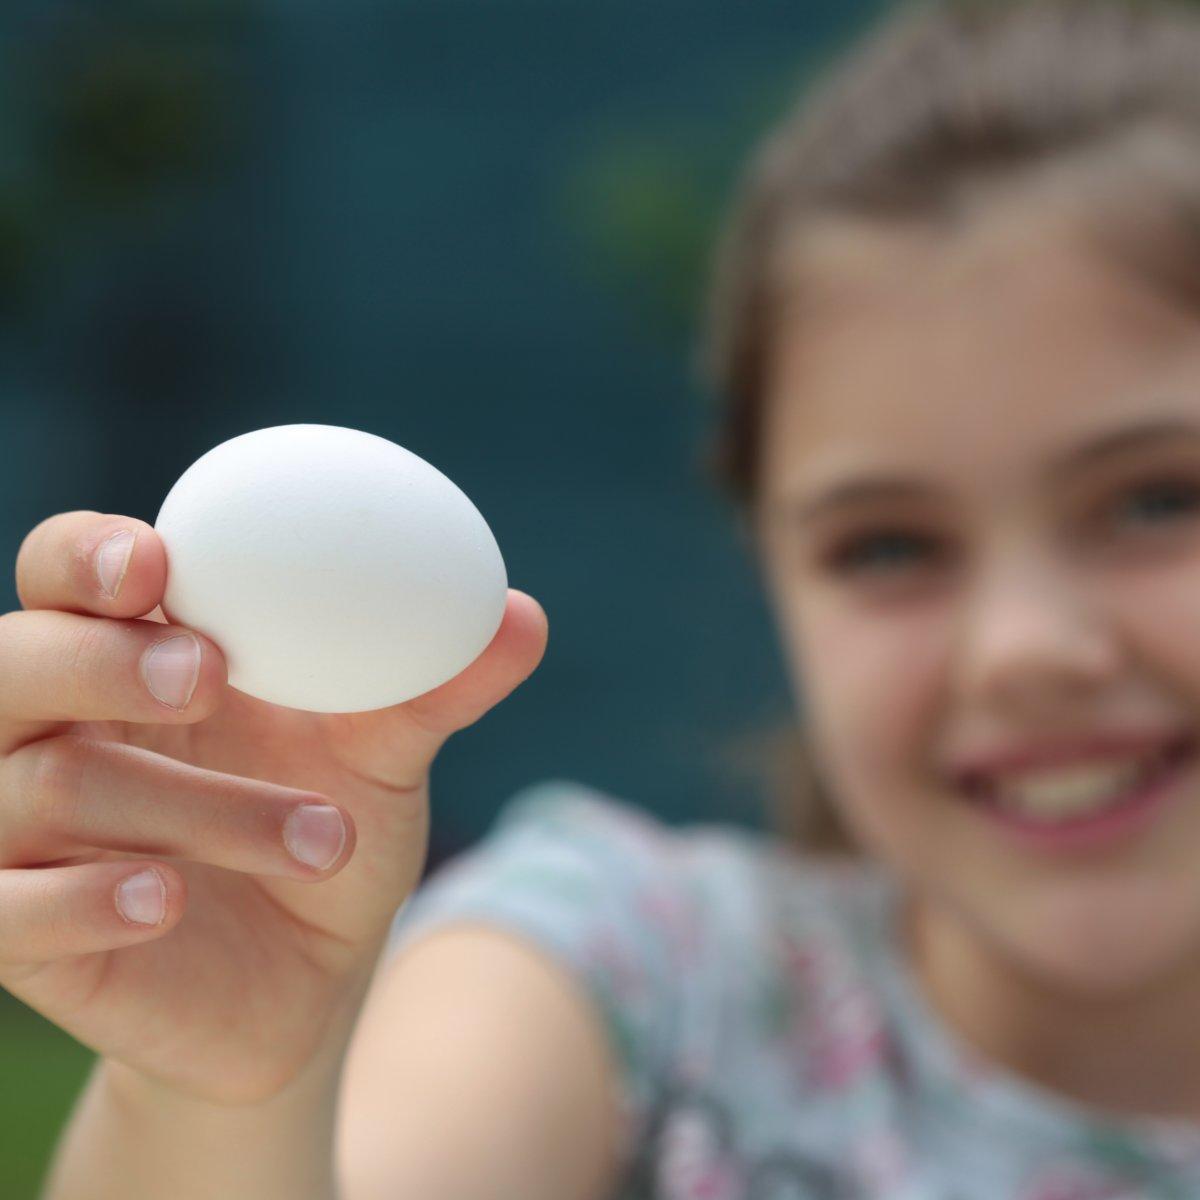 Foto: Mädchen präsentiert Ei